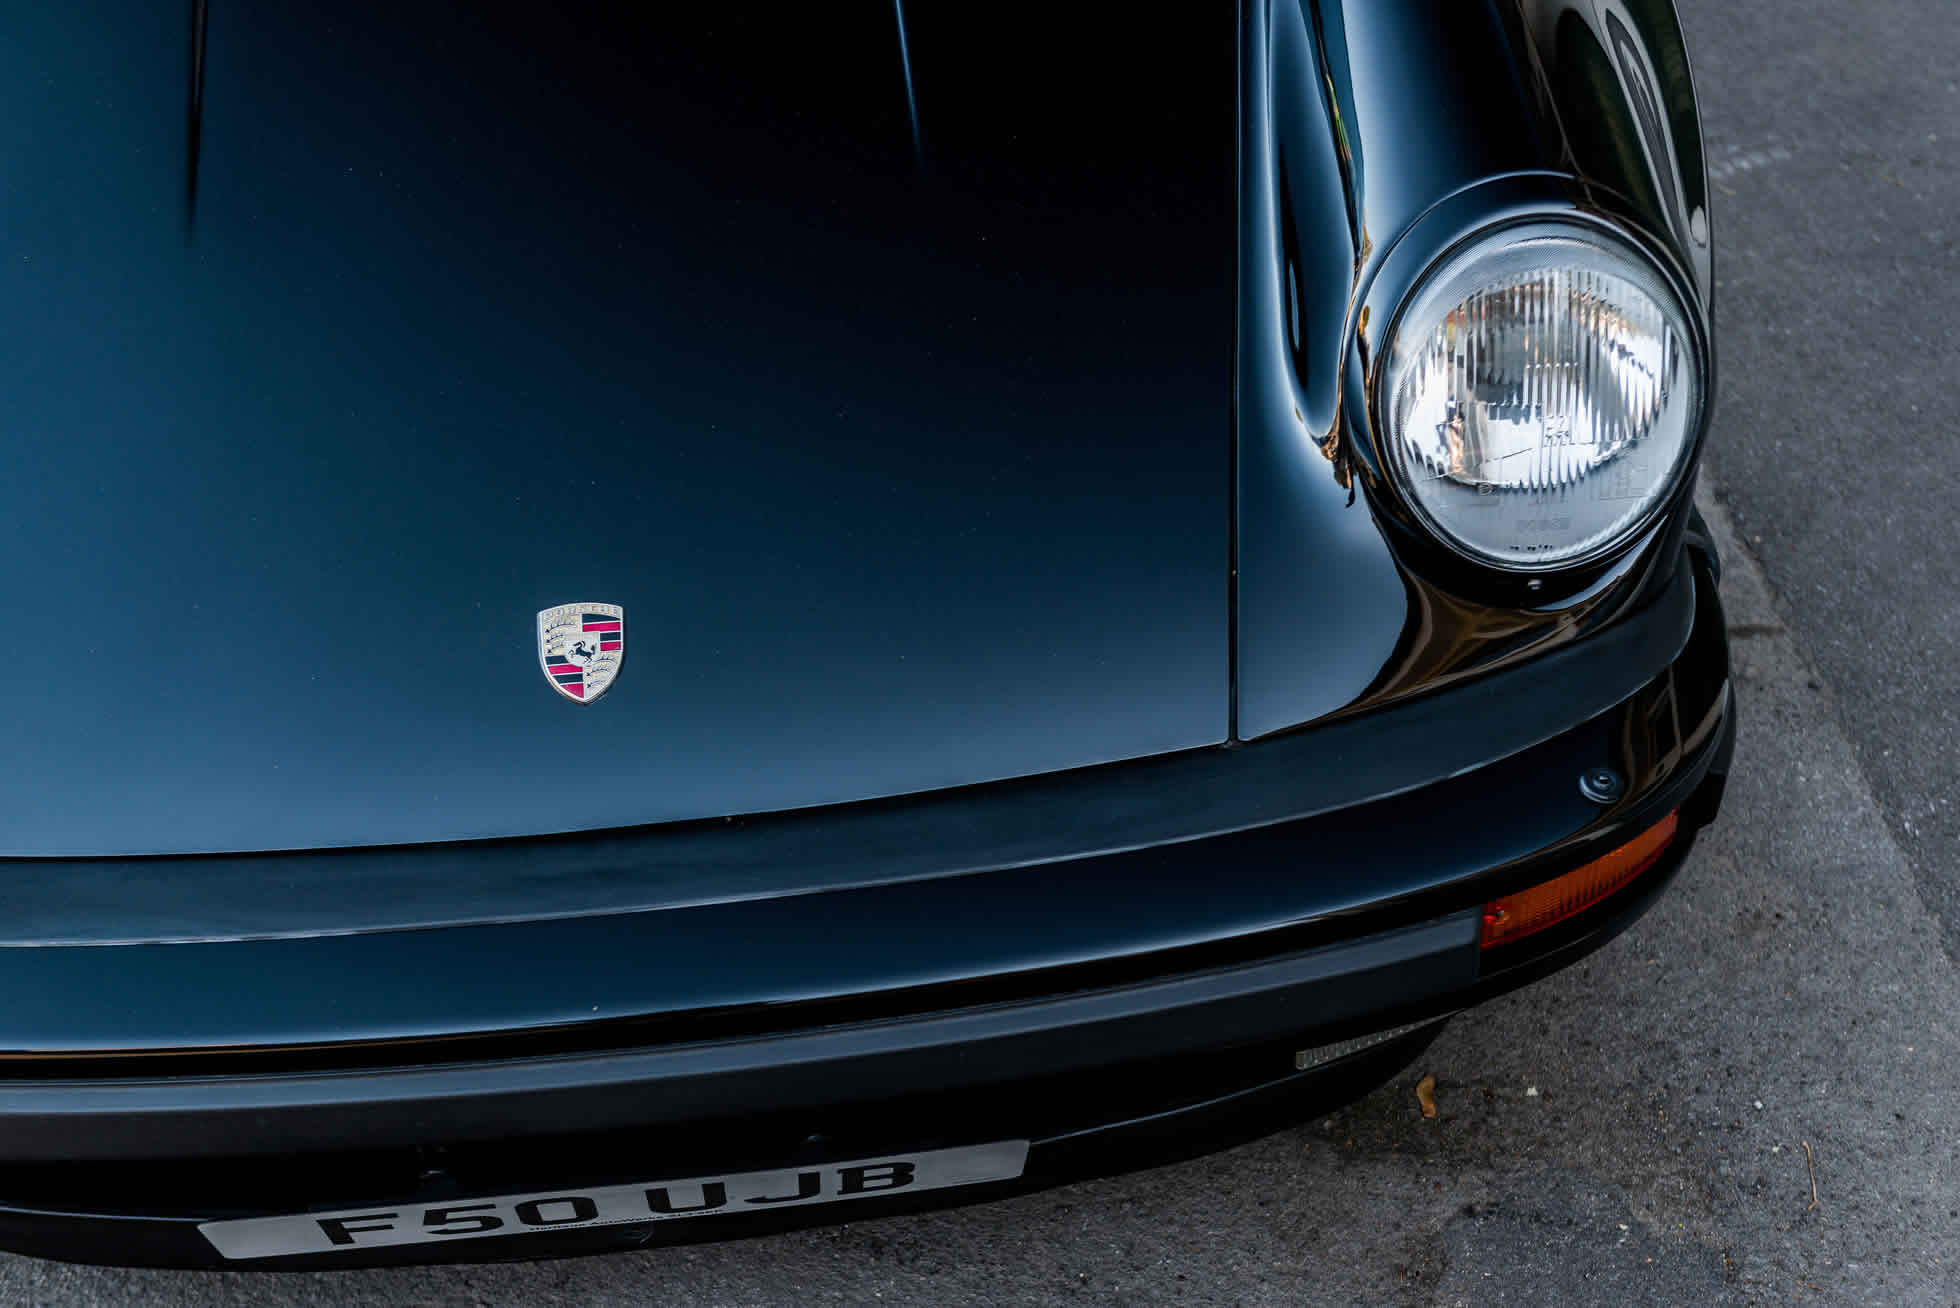 For Sale 1989 Porsche 930 3.3 Turbo lights